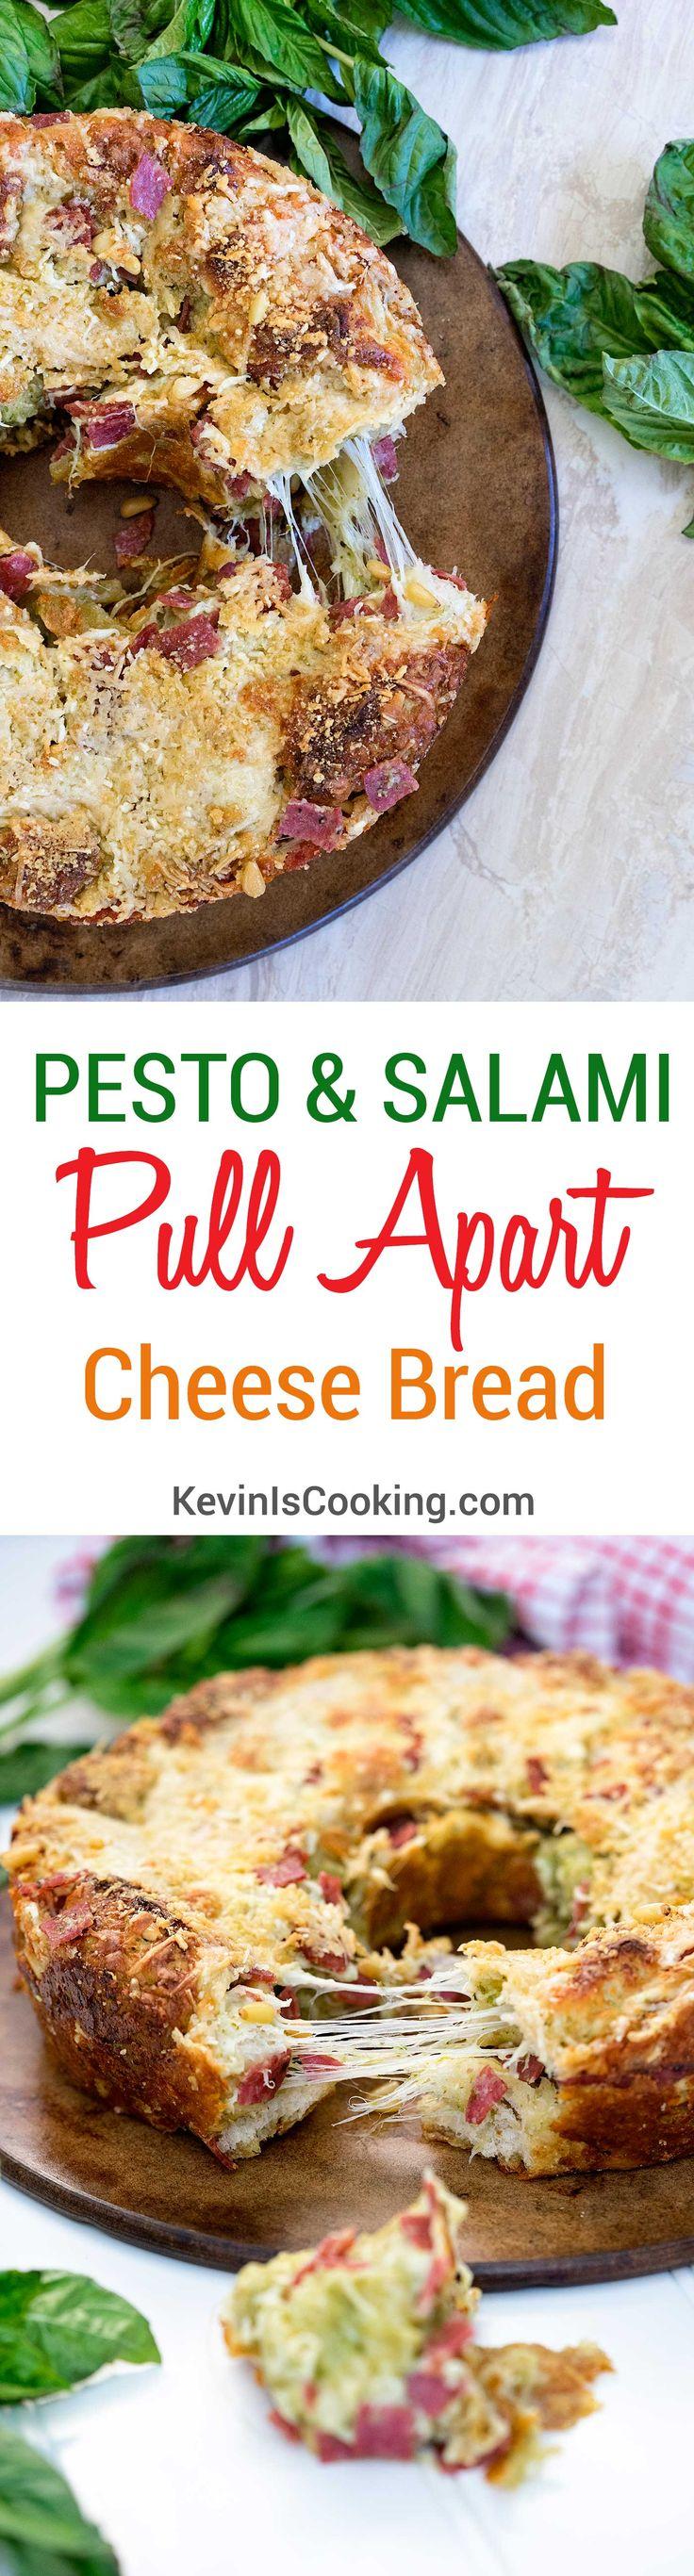 Pesto & Salami Pull Apart Cheese Bread Recipe via @keviniscooking